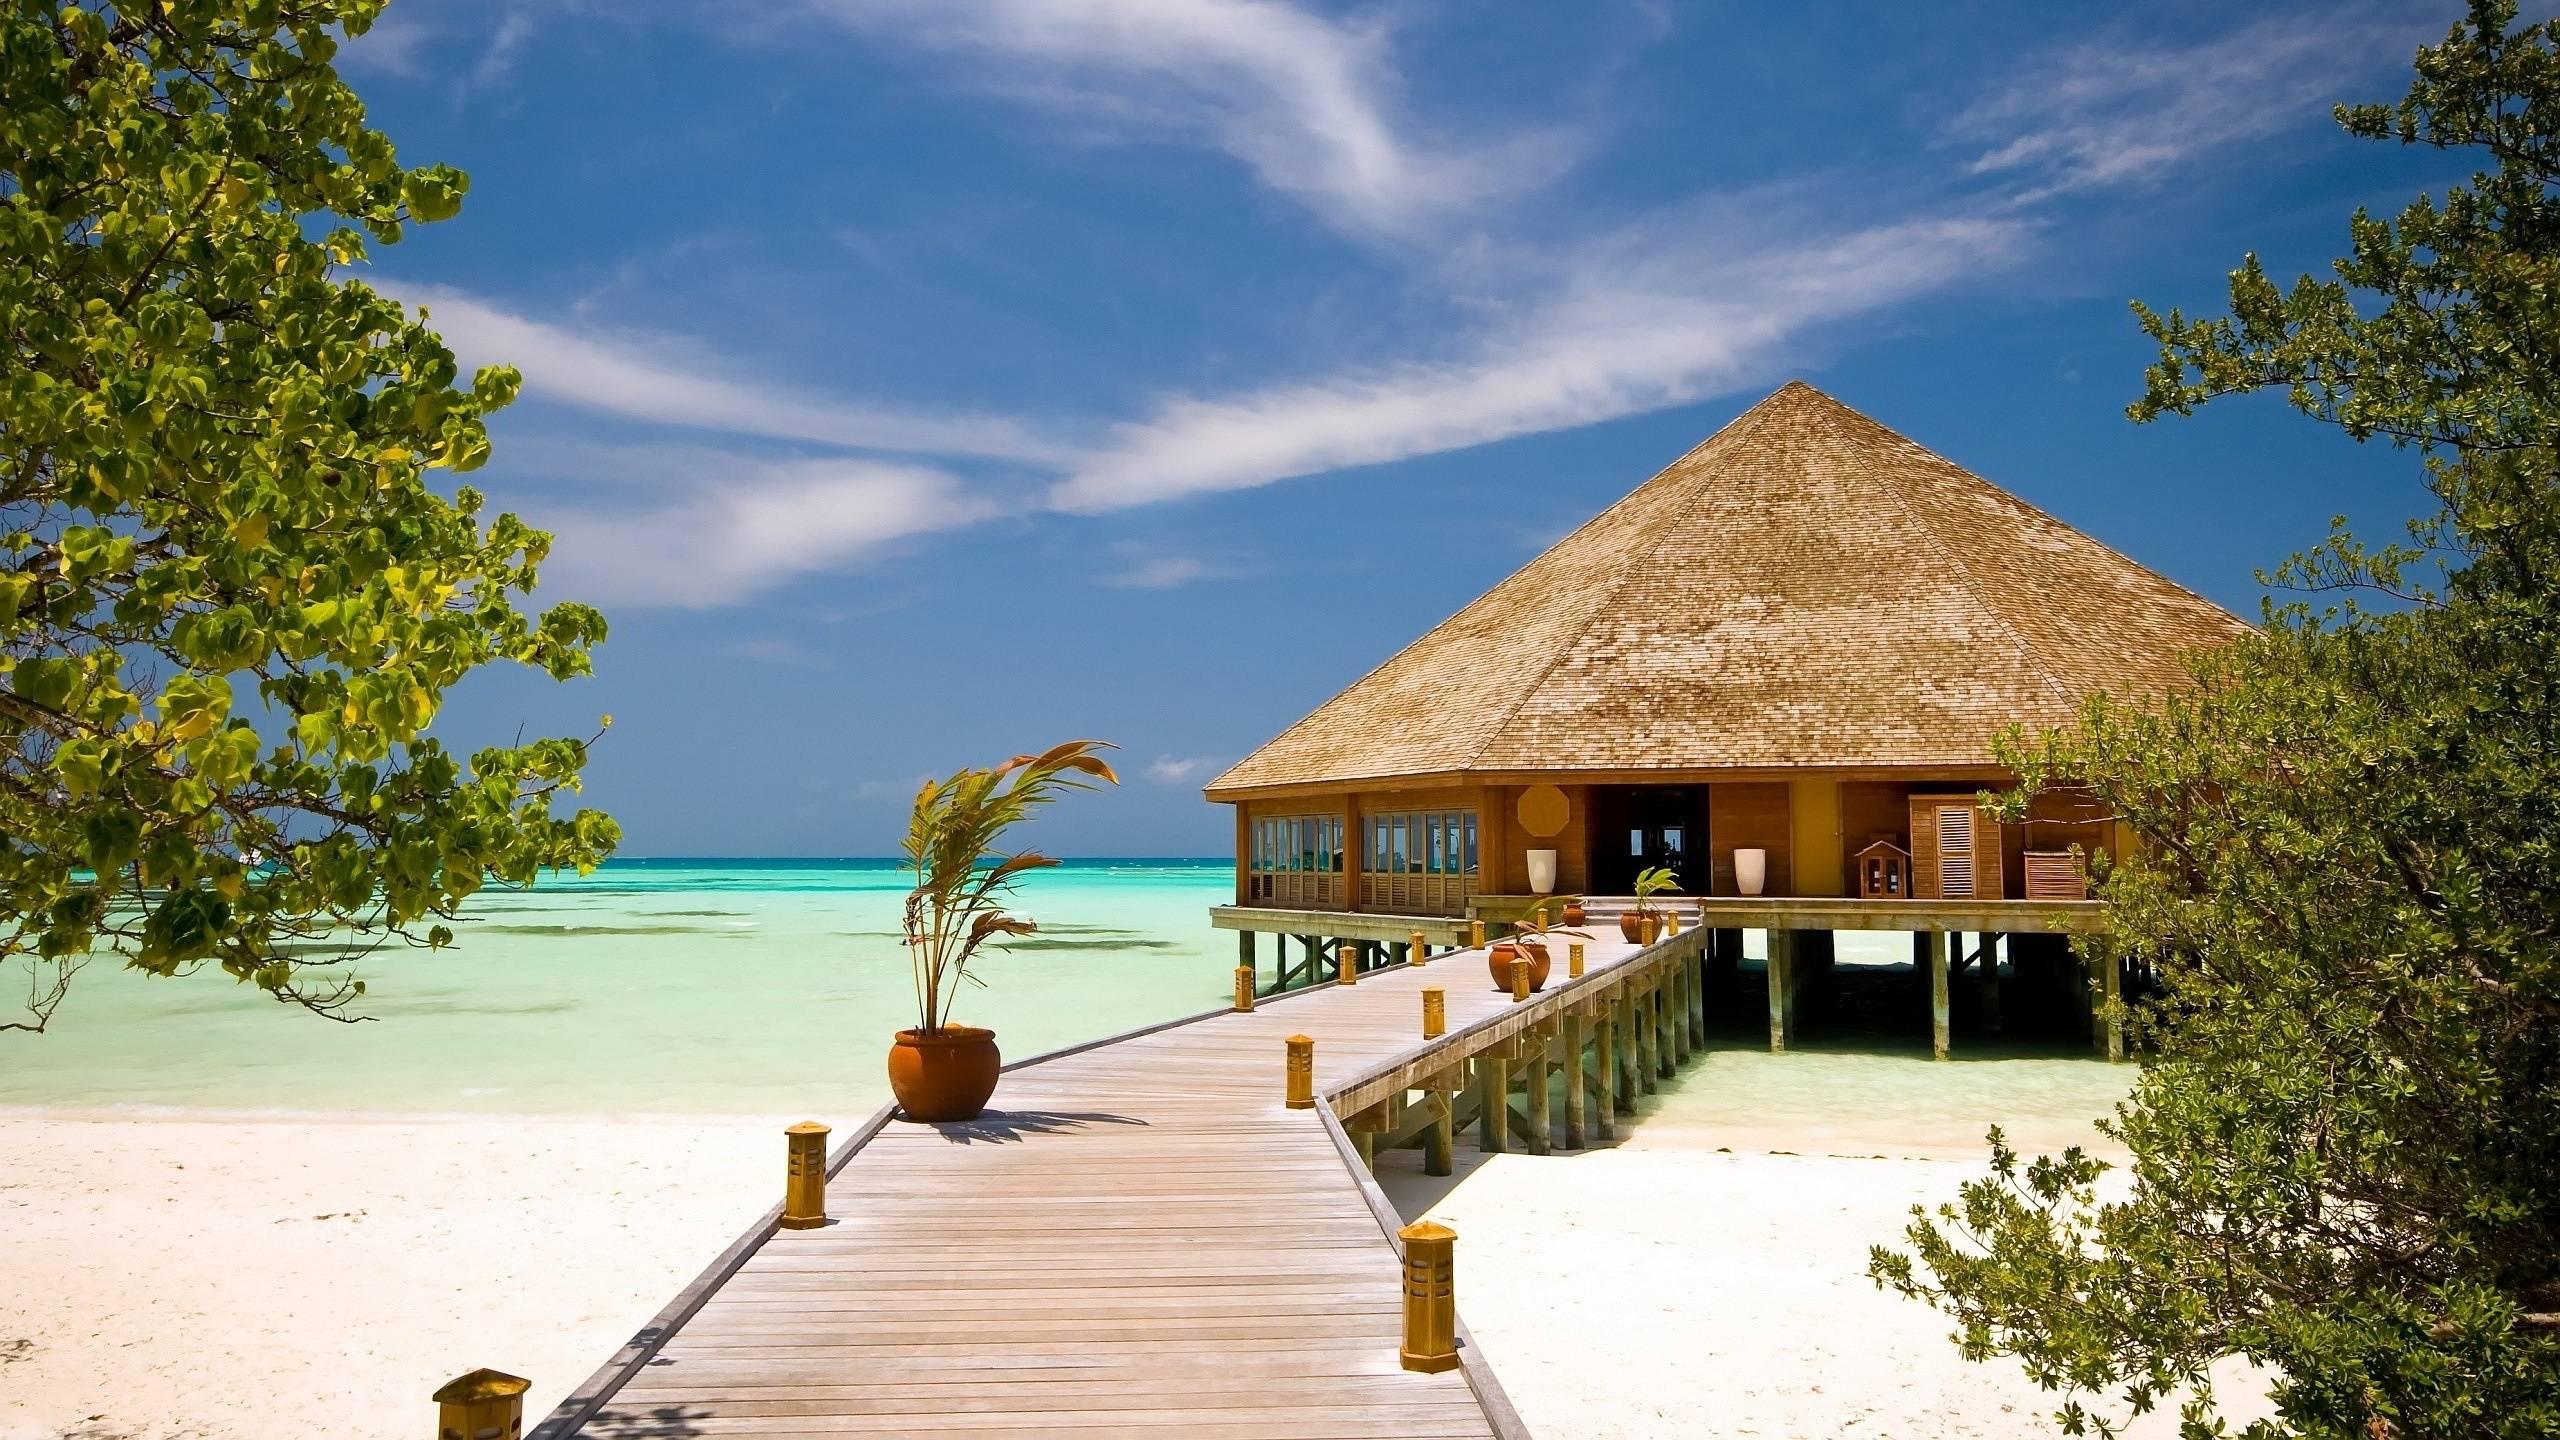 Beach Resort Wallpaper 21: Maldives Wallpapers